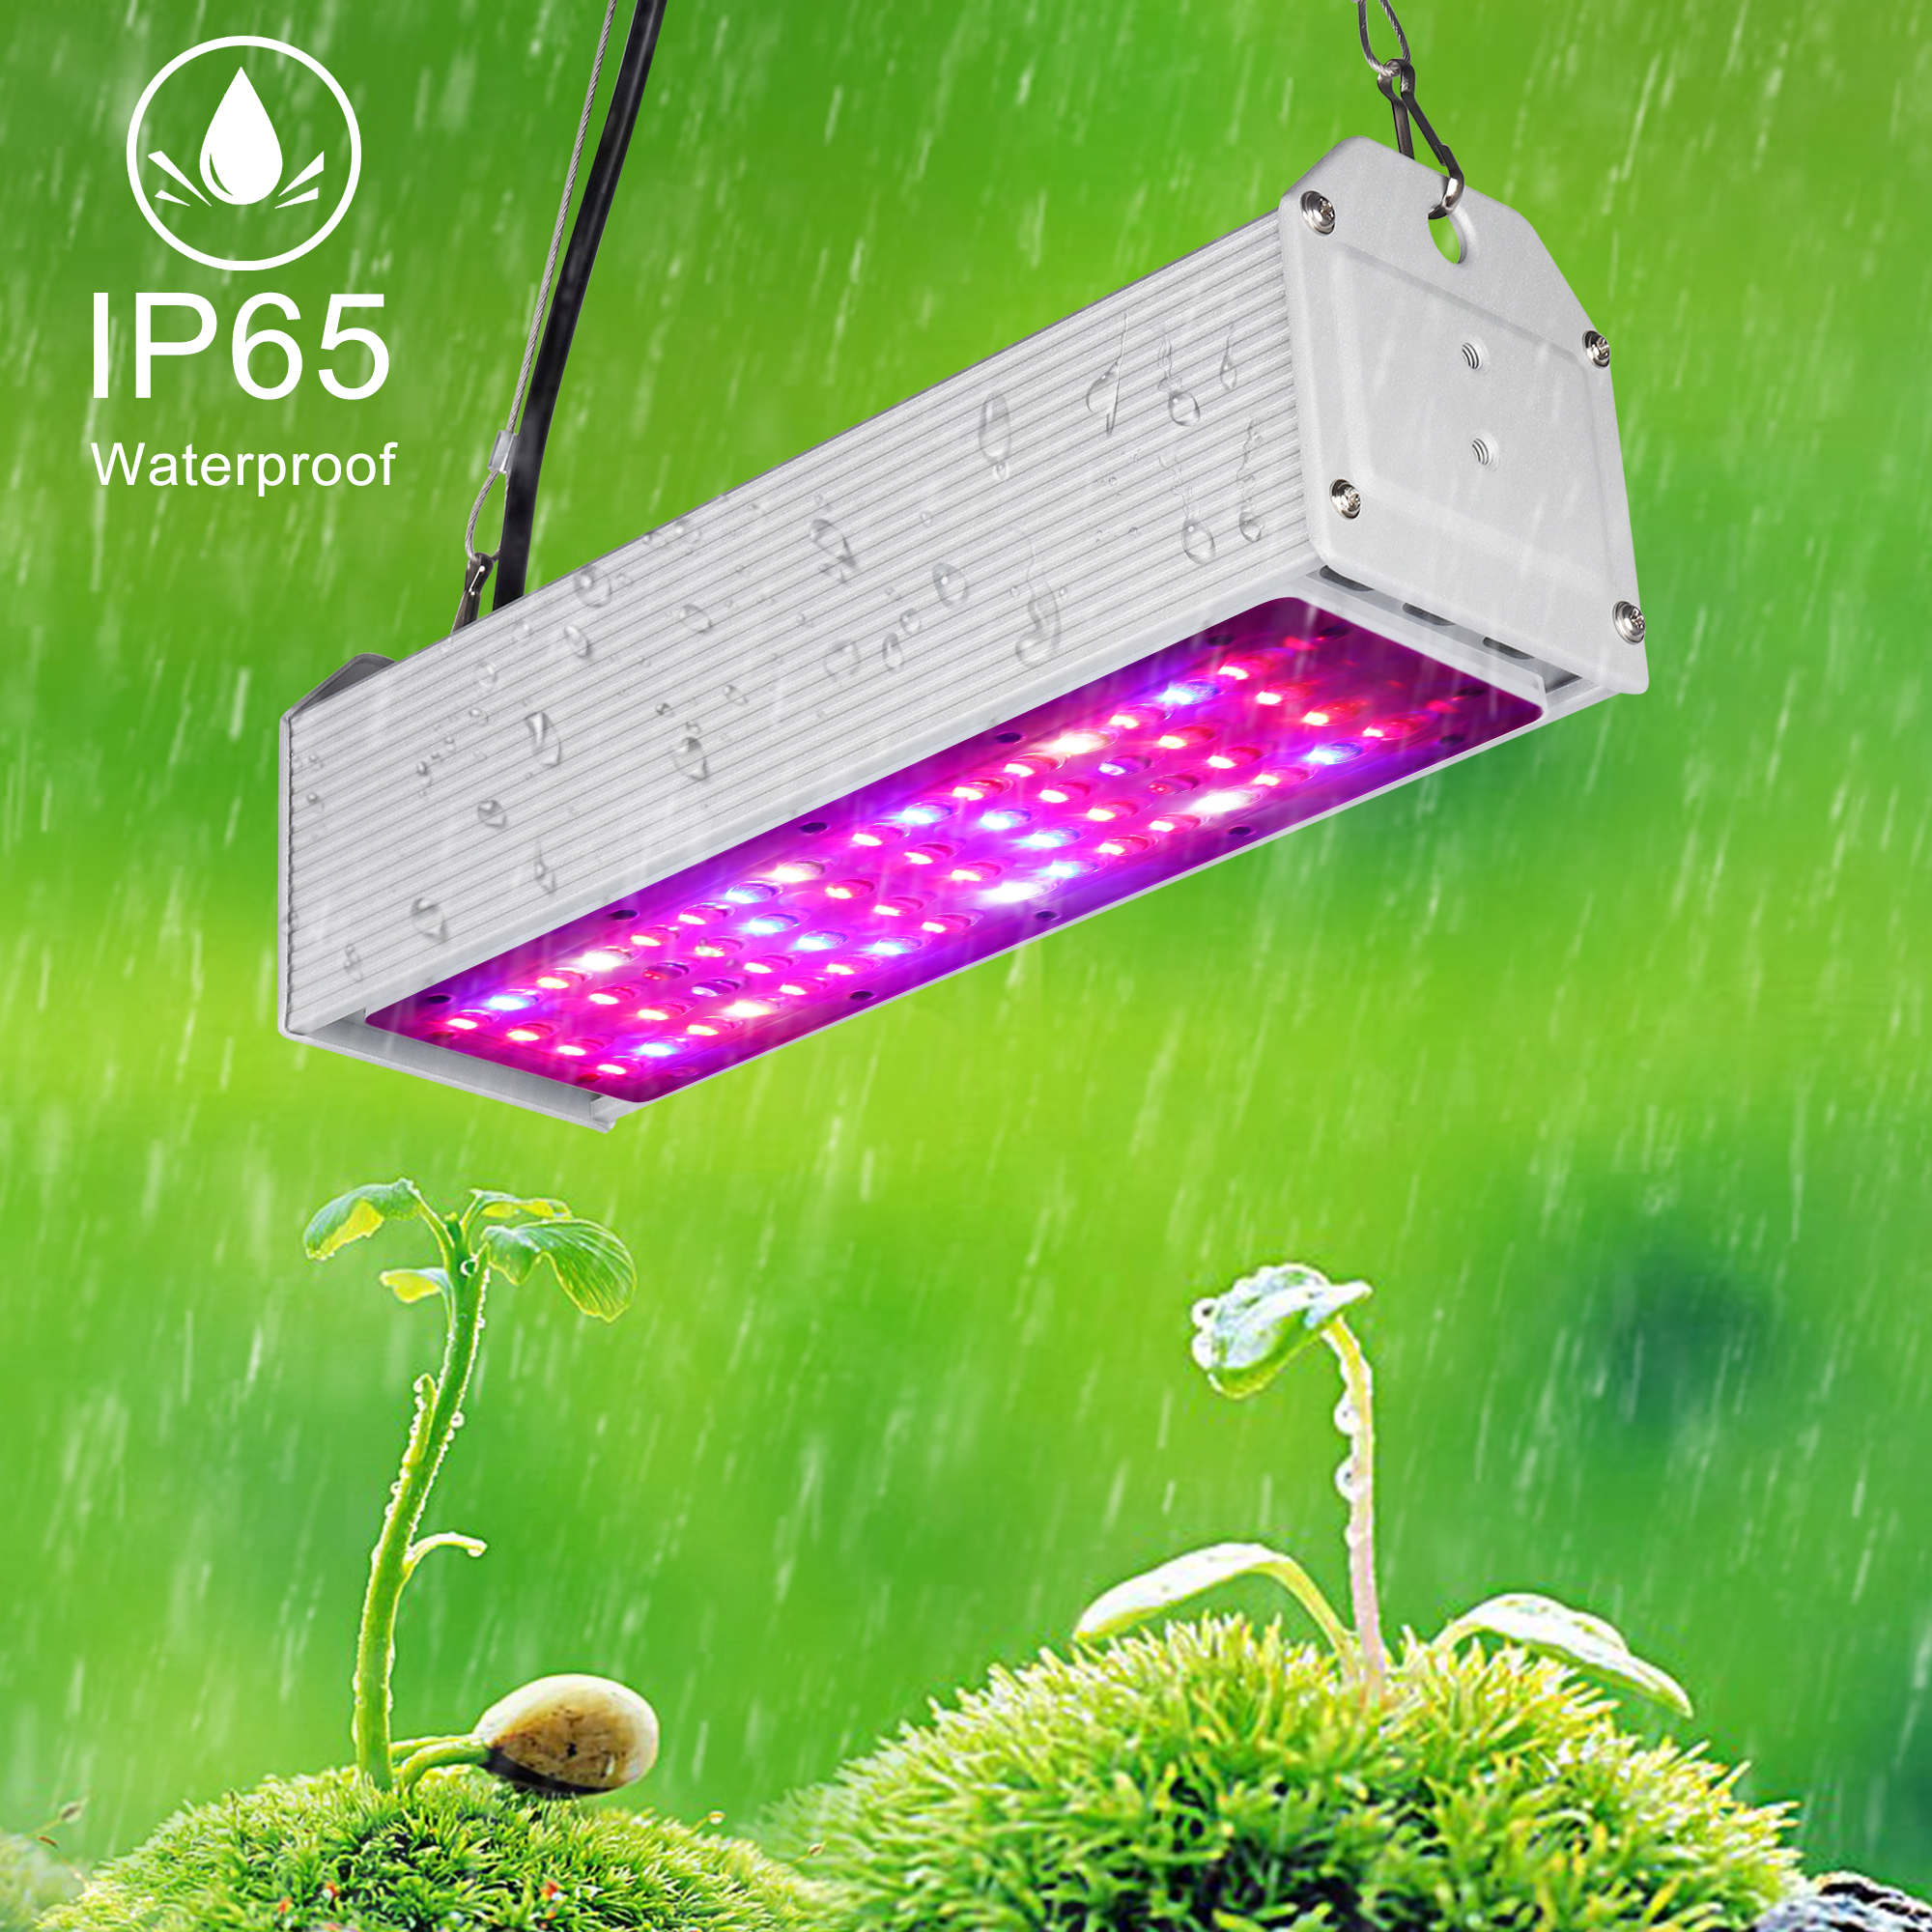 Sinjia Waterproof Full Spectrum 150w Led Grow Lights Greenhouse Bar Growing Led Lights